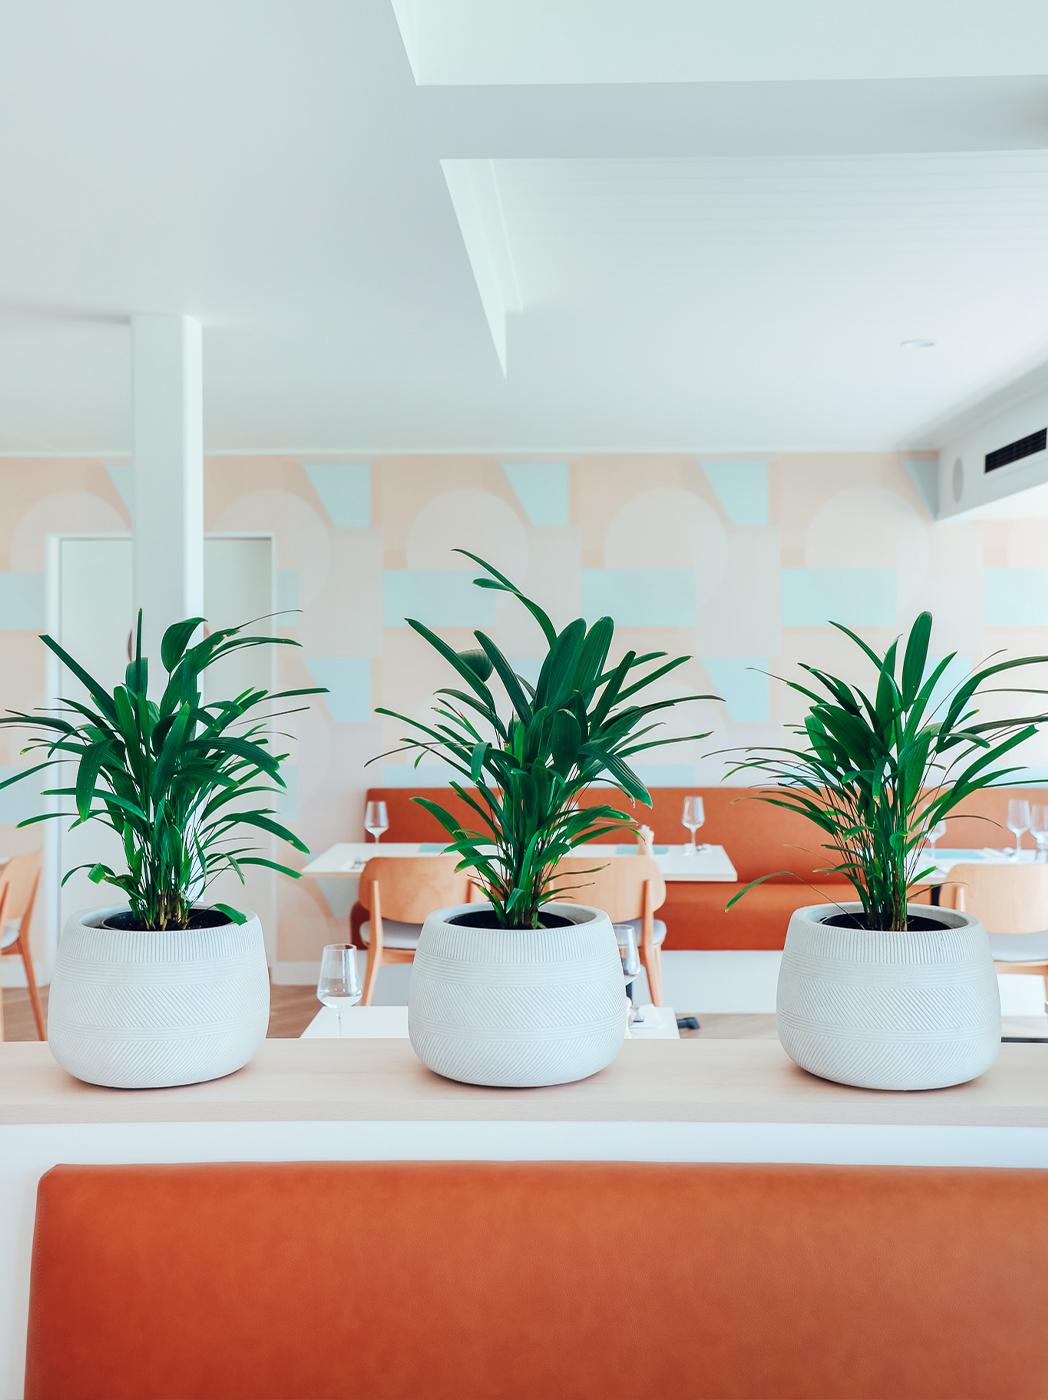 Three pot plants sitting on a ledge in a restaurant.